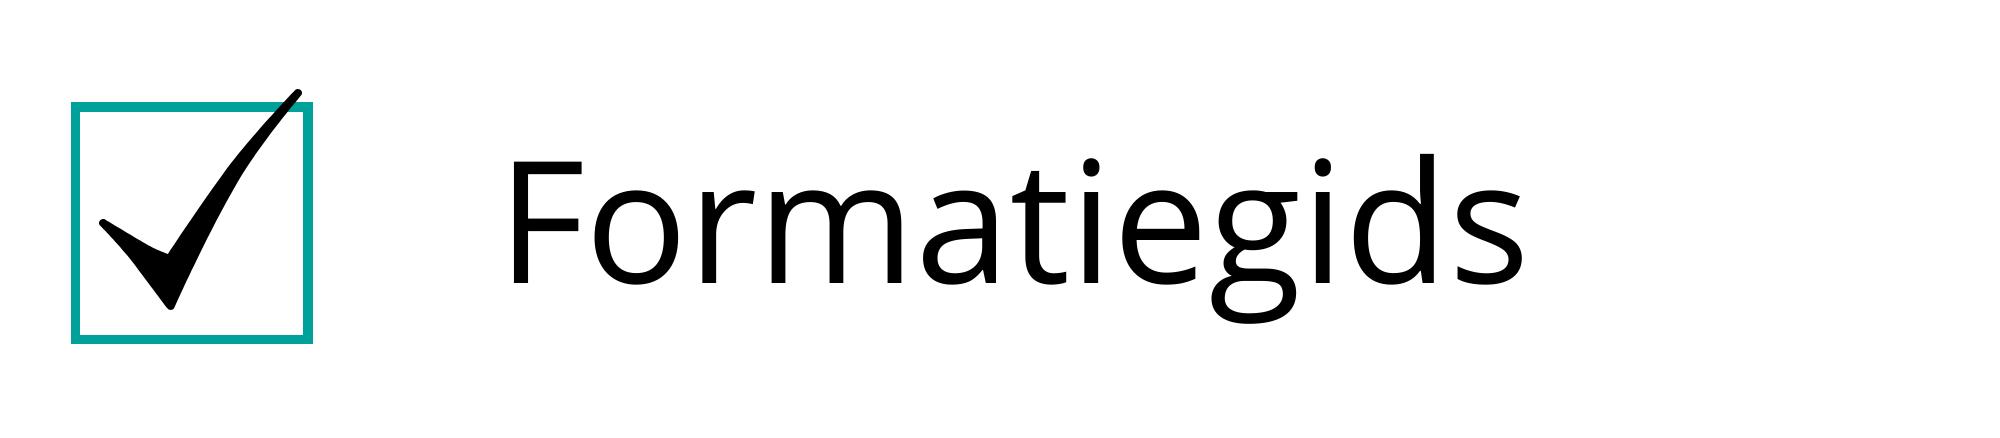 Formatiegids